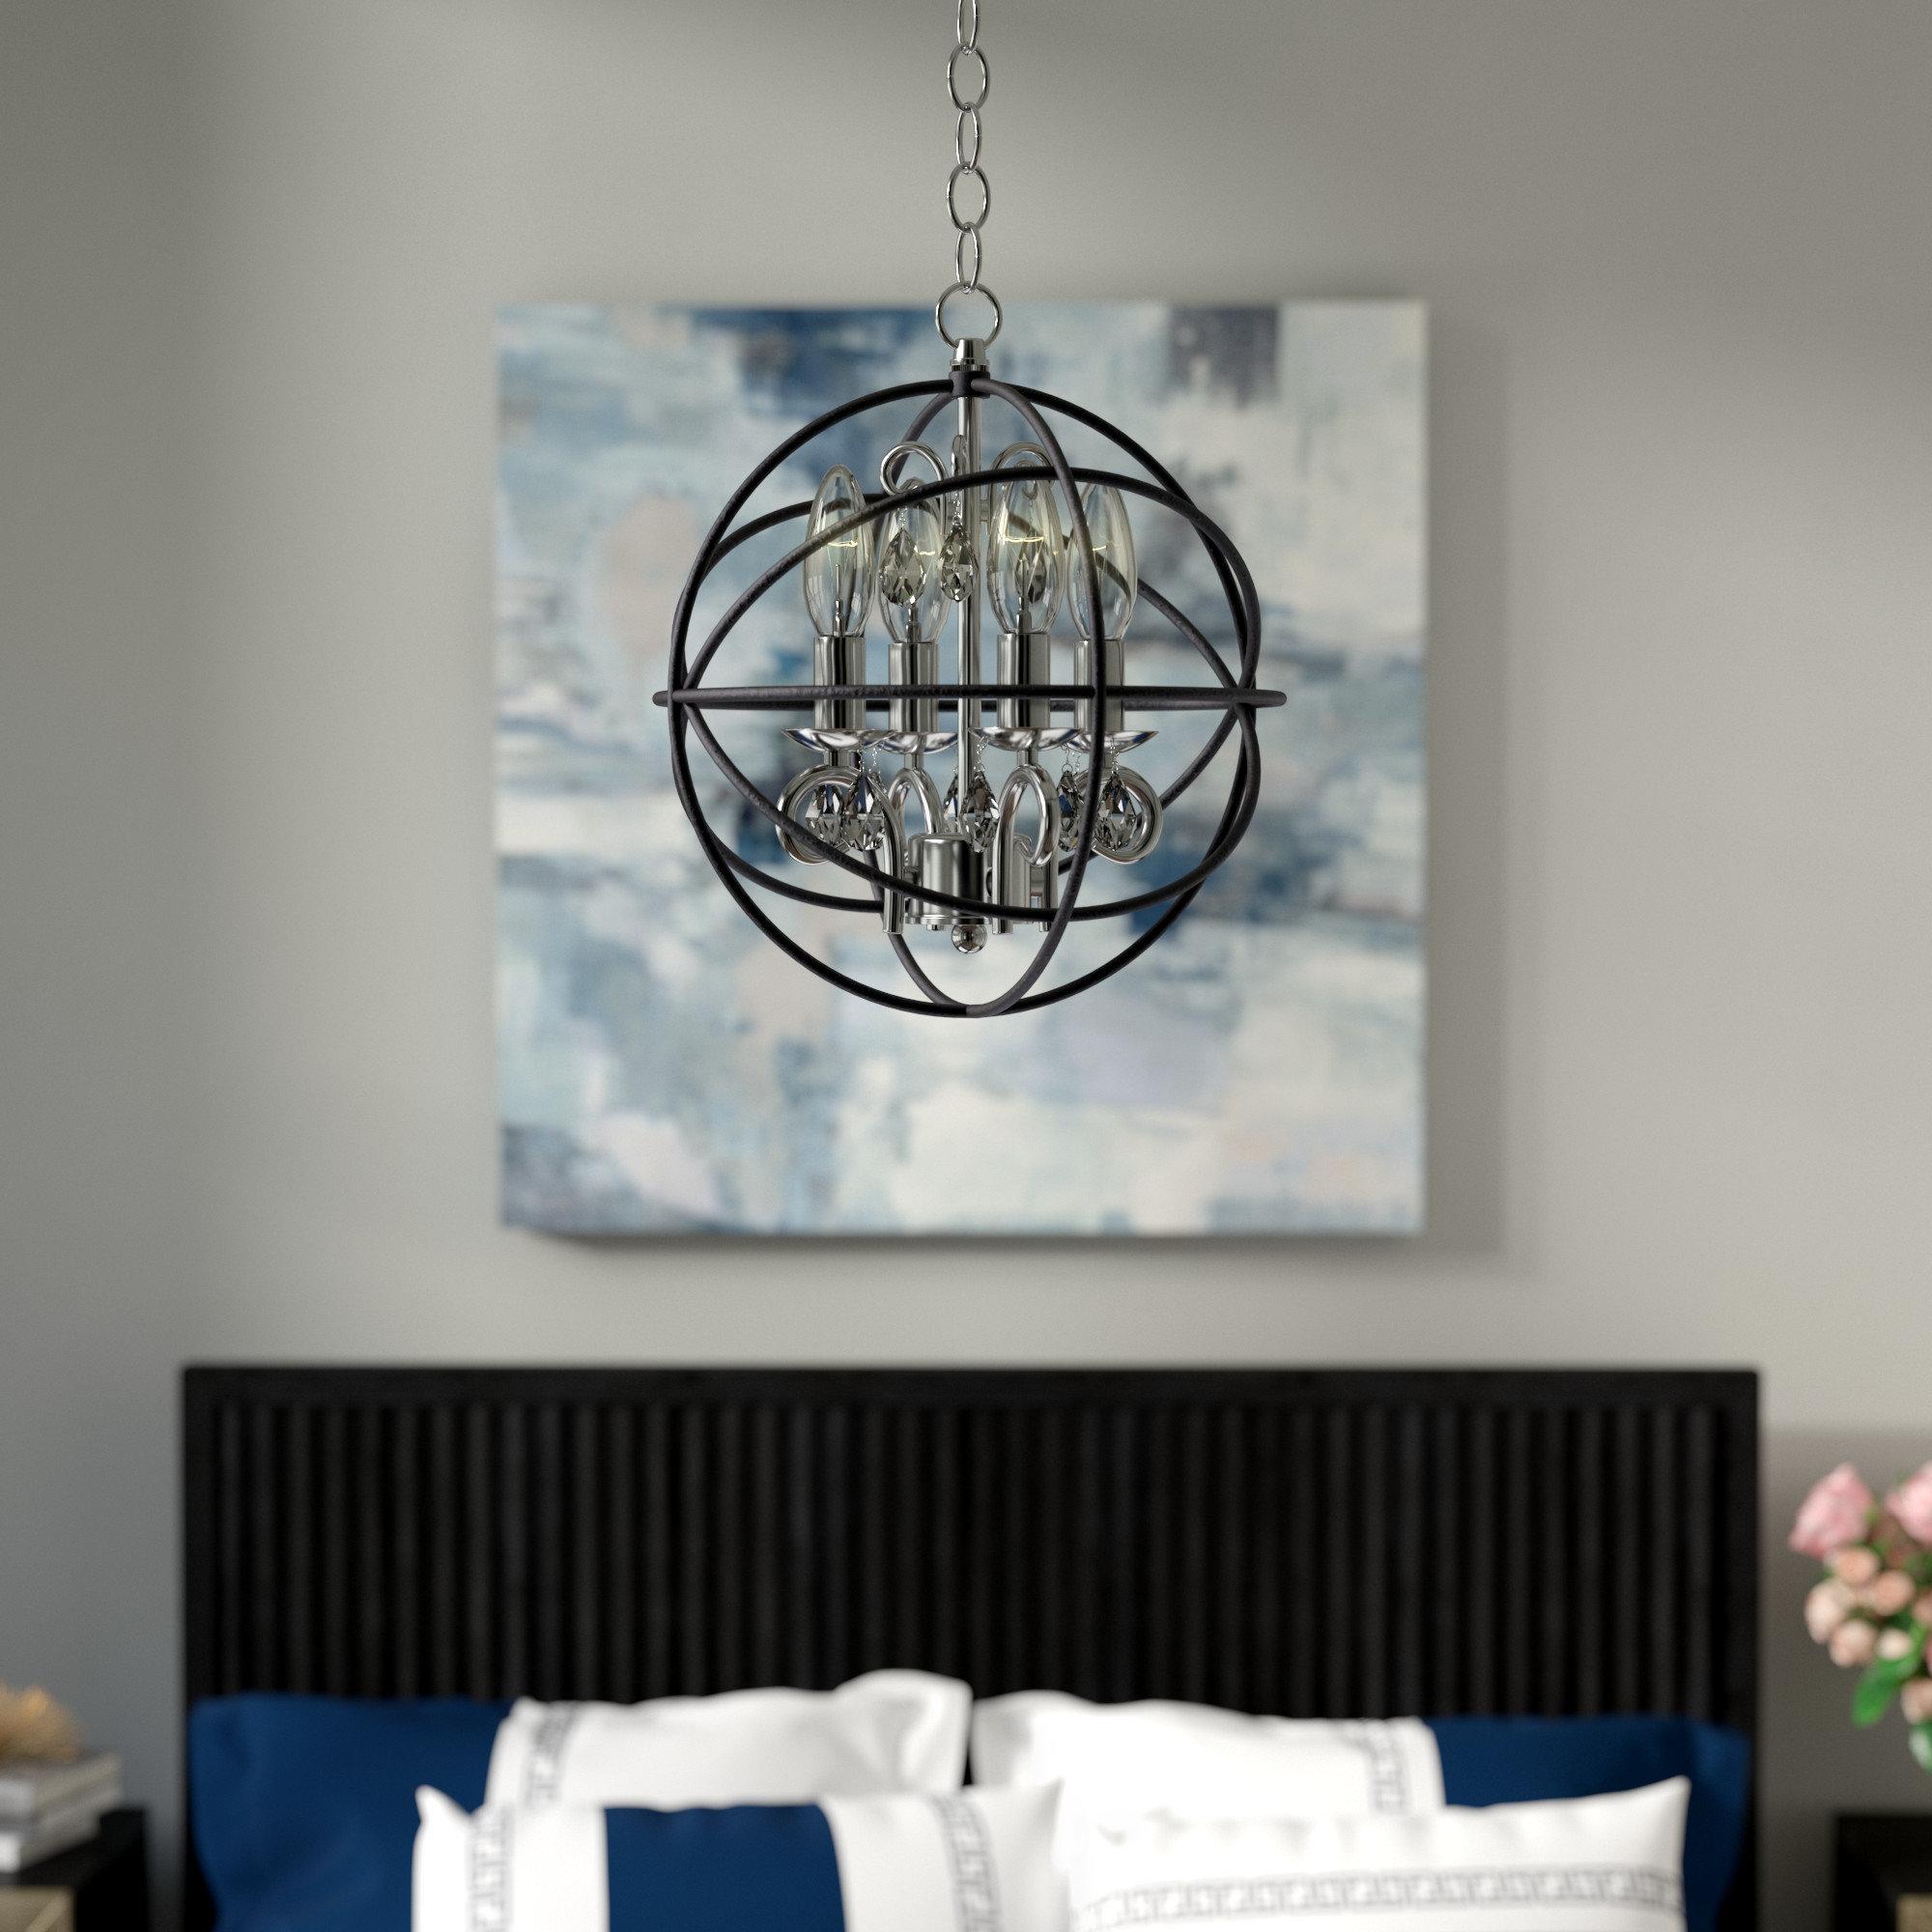 Willa Arlo Interiors Alden 3 Light Globe Pendant With Regard To Favorite Alden 3 Light Single Globe Pendants (View 11 of 25)